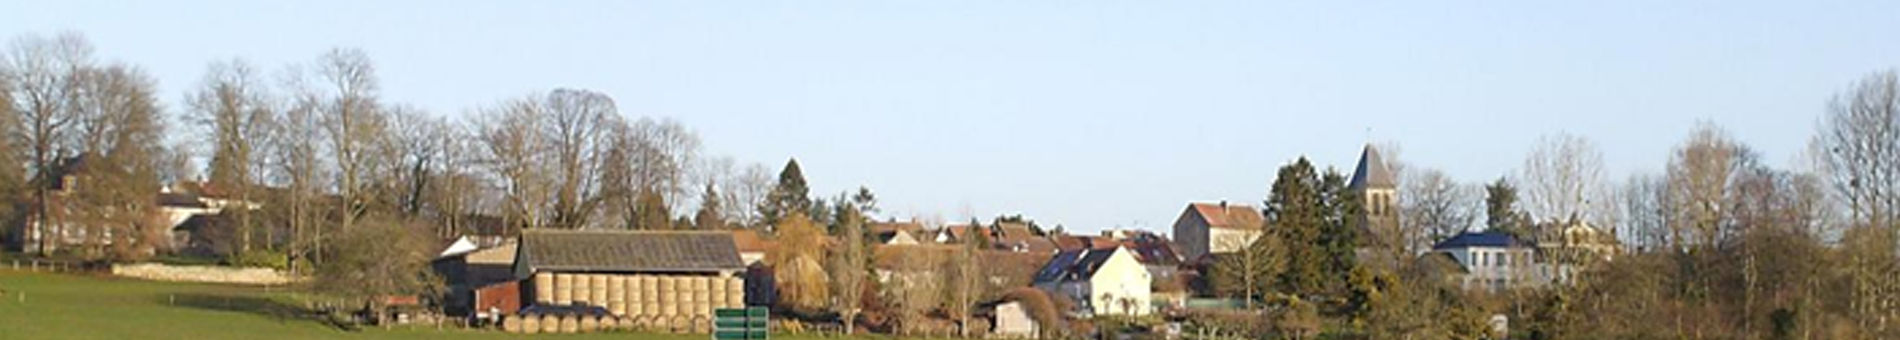 Aincourt